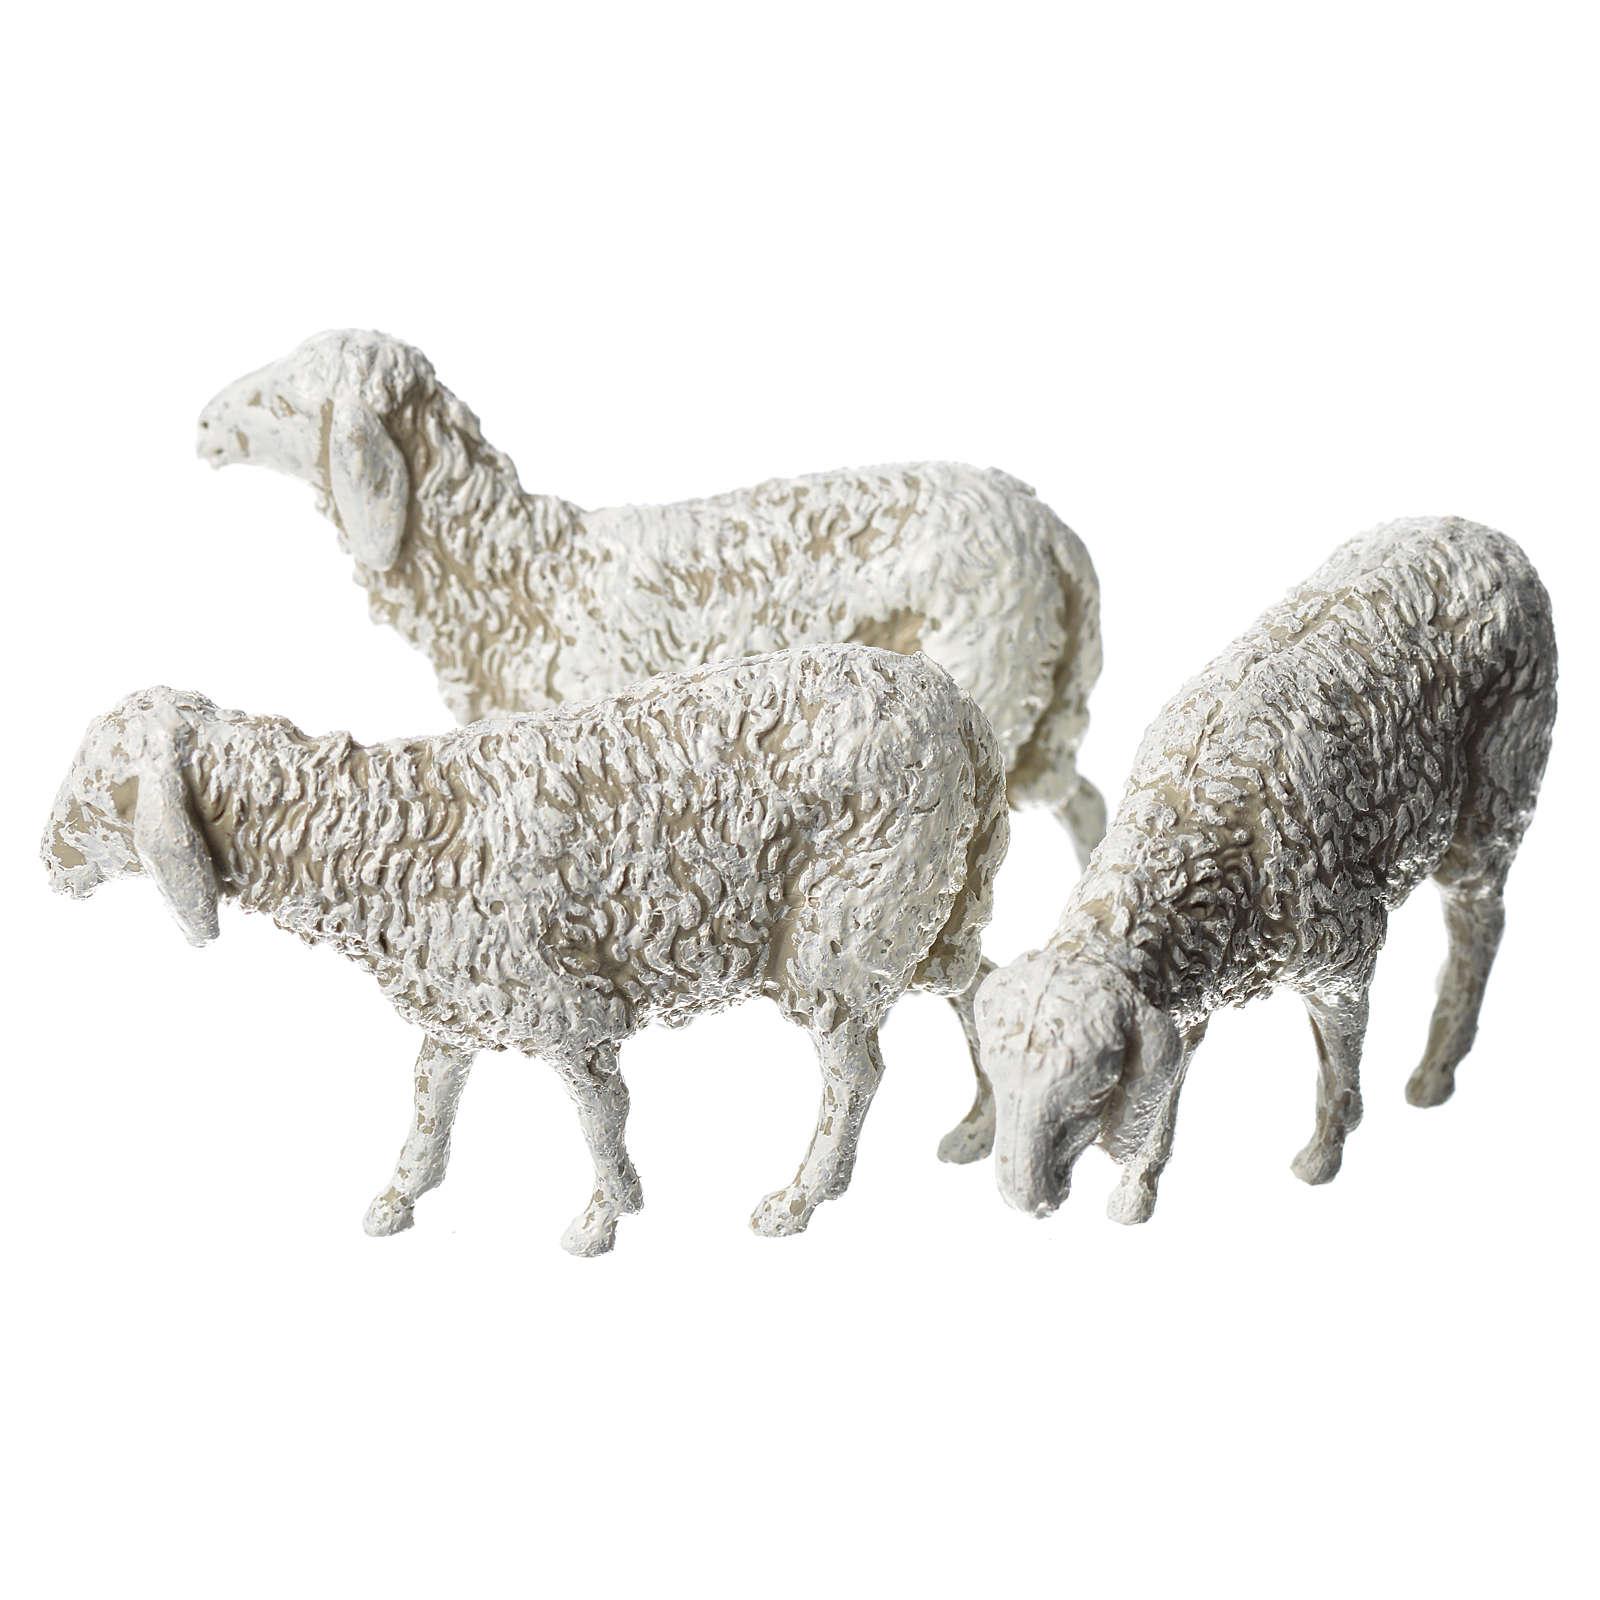 Nativity Scene Sheep by Moranduzzo 8cm, 6 pieces 4